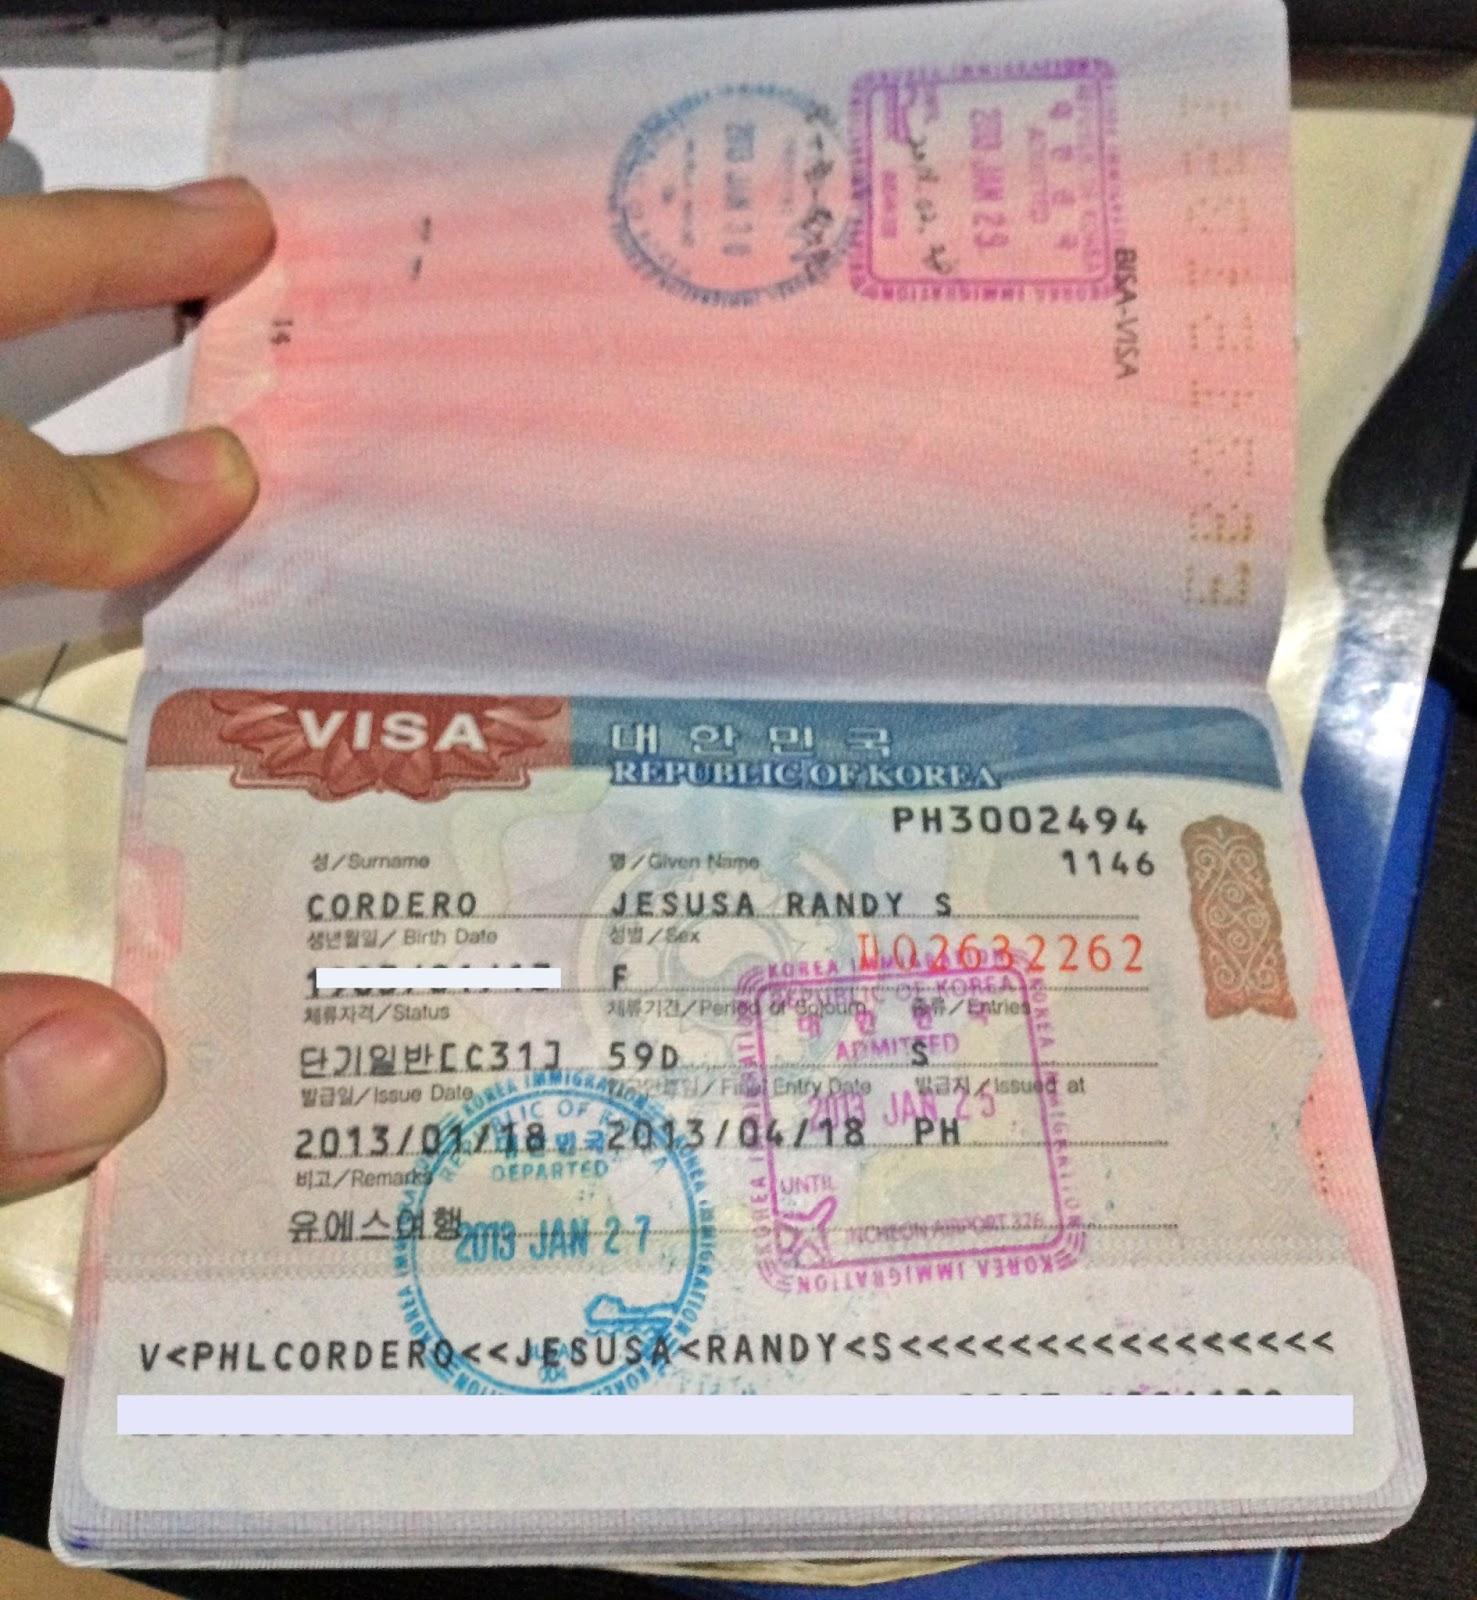 photo+2+%25282%2529 Japan Visa Application Form Sample Philippines on